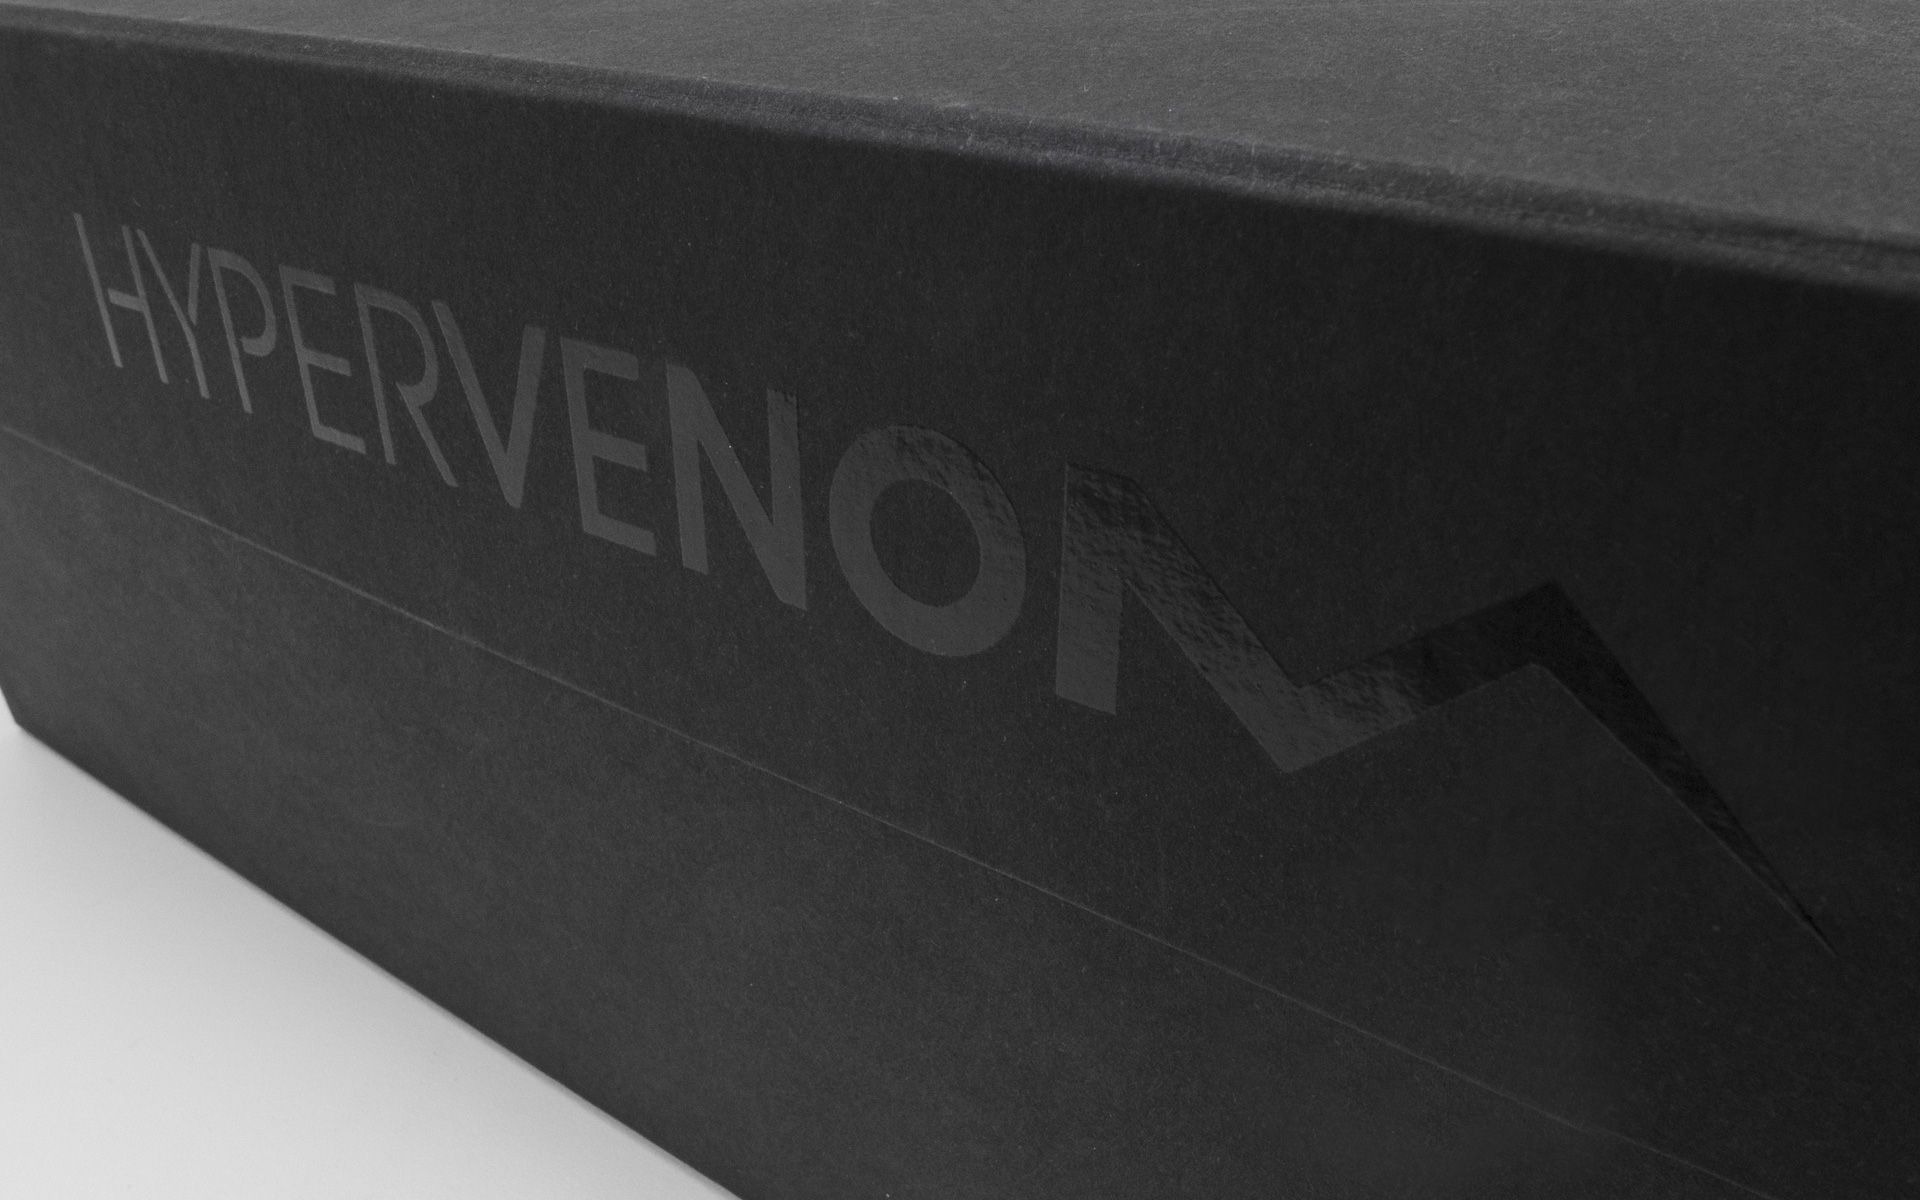 Hypervenom II special pack global Release